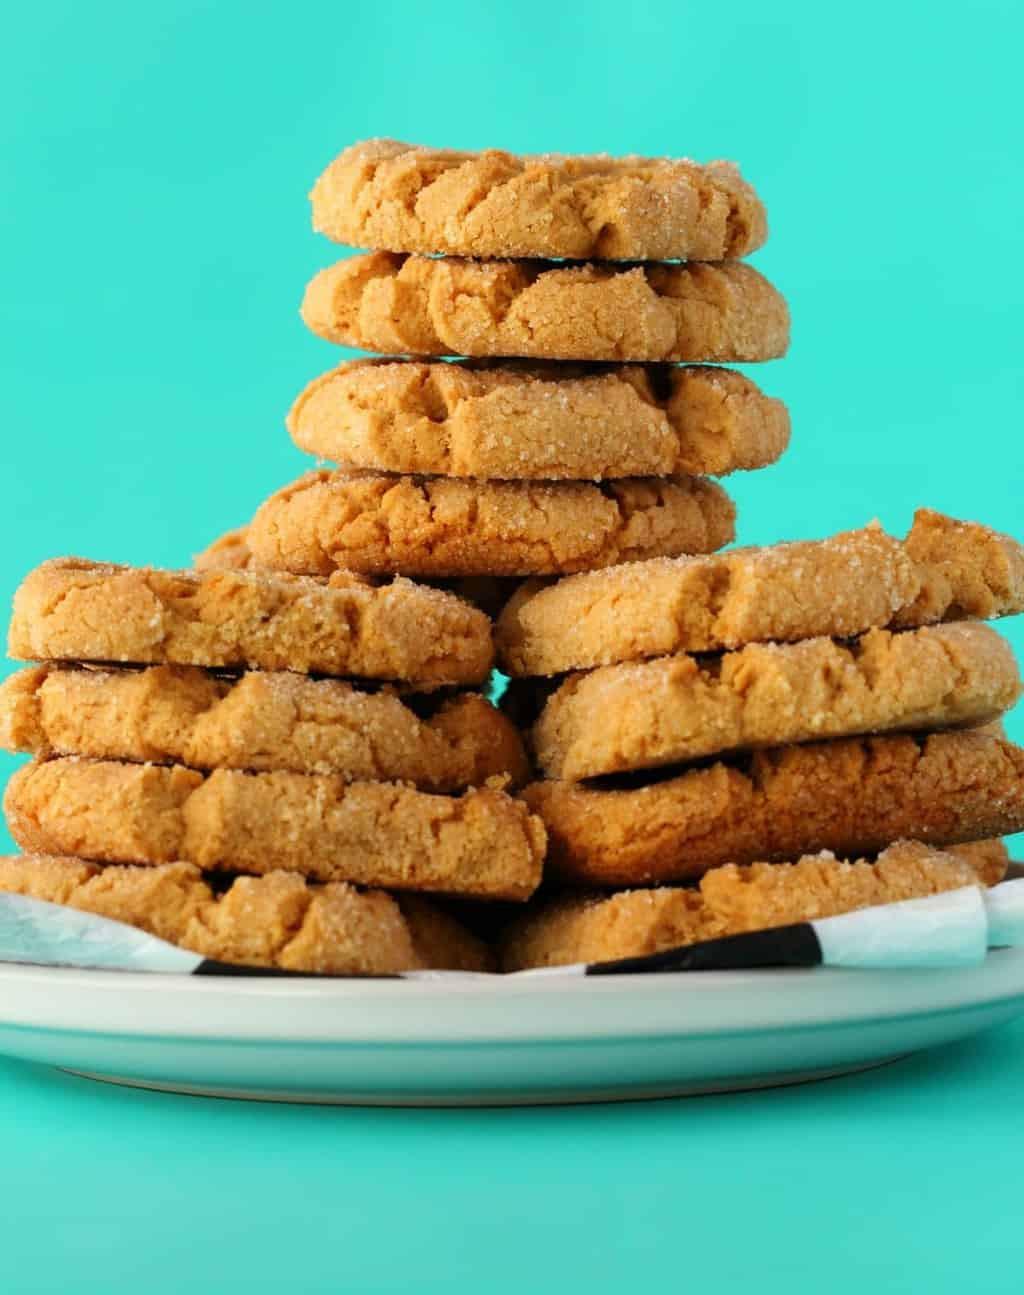 Peanut Butter Vegan Cookies  Crunchy Vegan Peanut Butter Cookies Loving It Vegan